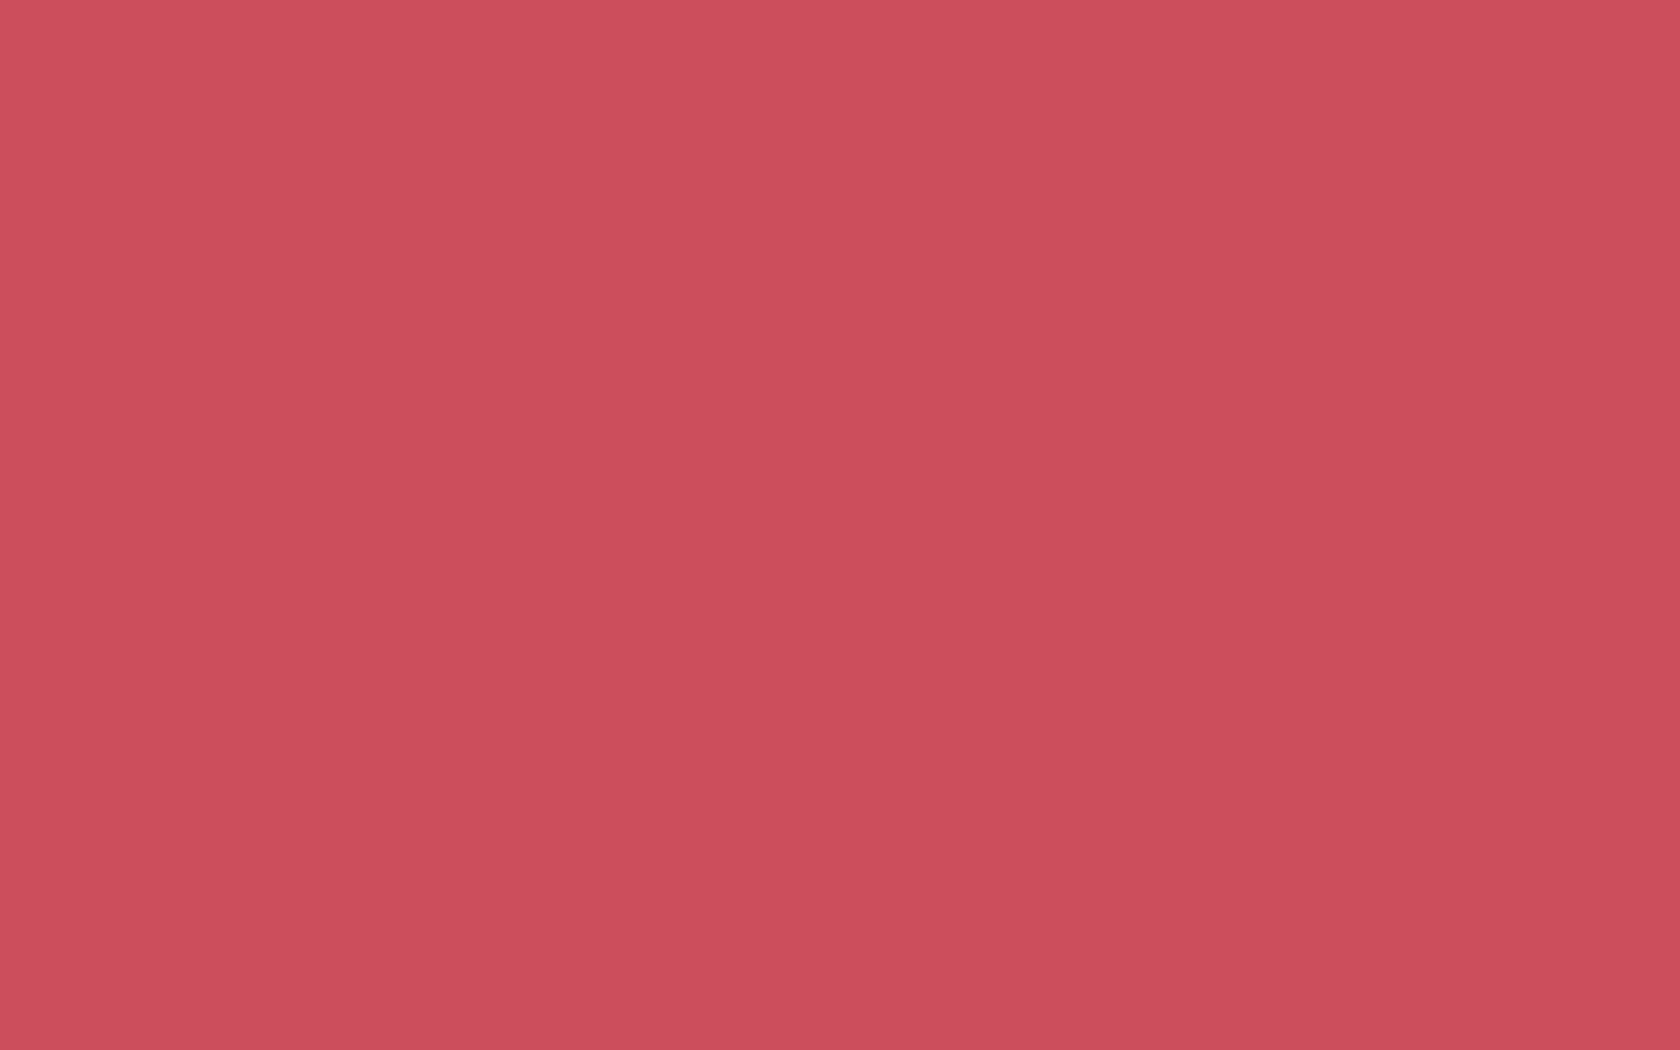 1680x1050 Dark Terra Cotta Solid Color Background